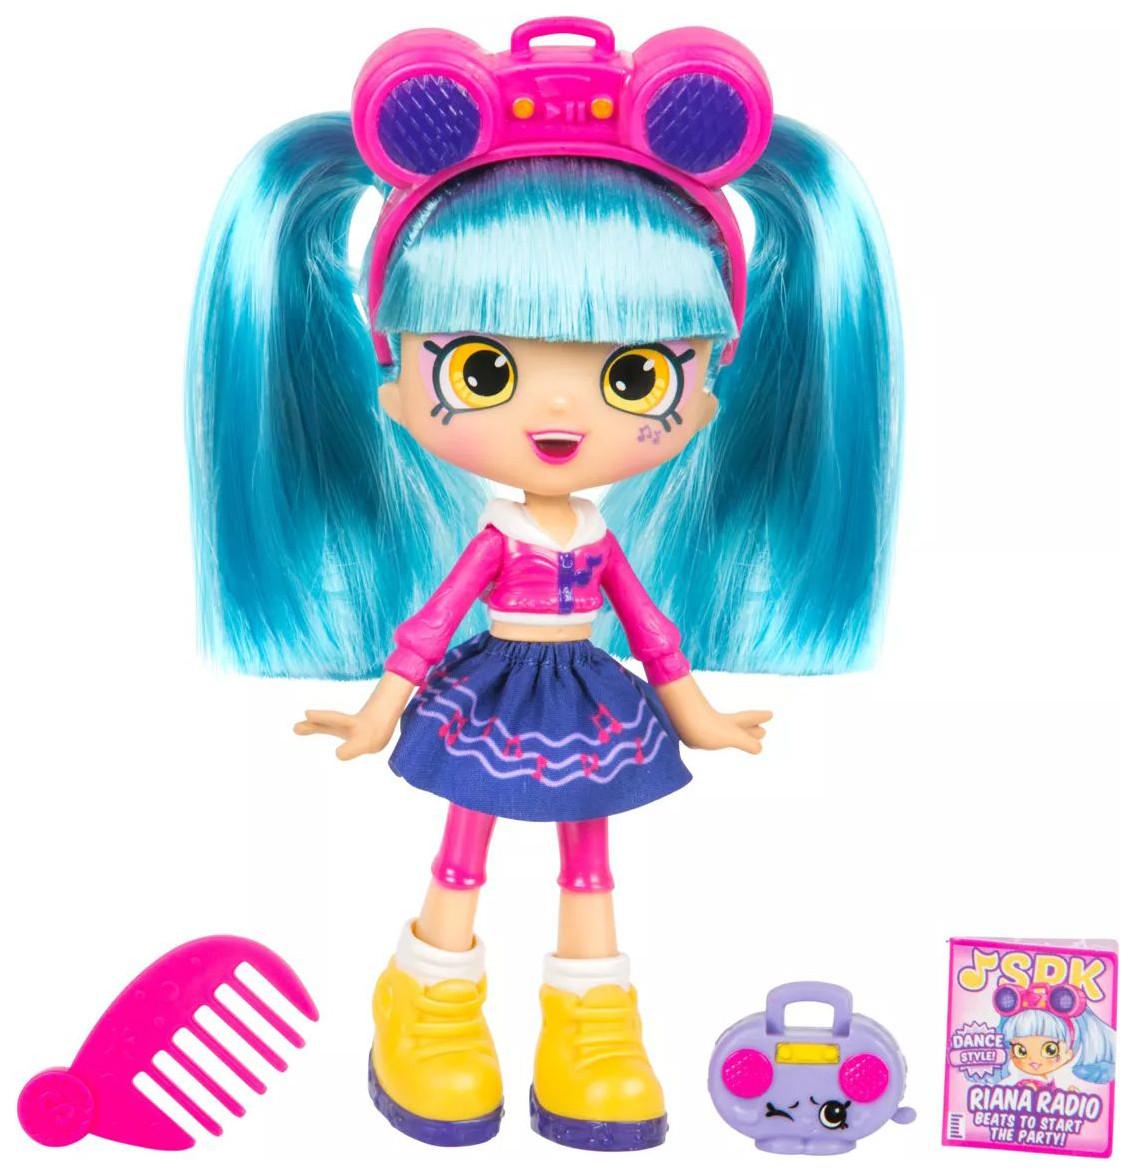 Shopkins Shoppie Лялька Ріана Радіо Танцювальний стиль 57418 Riana Radio Dance Style Doll